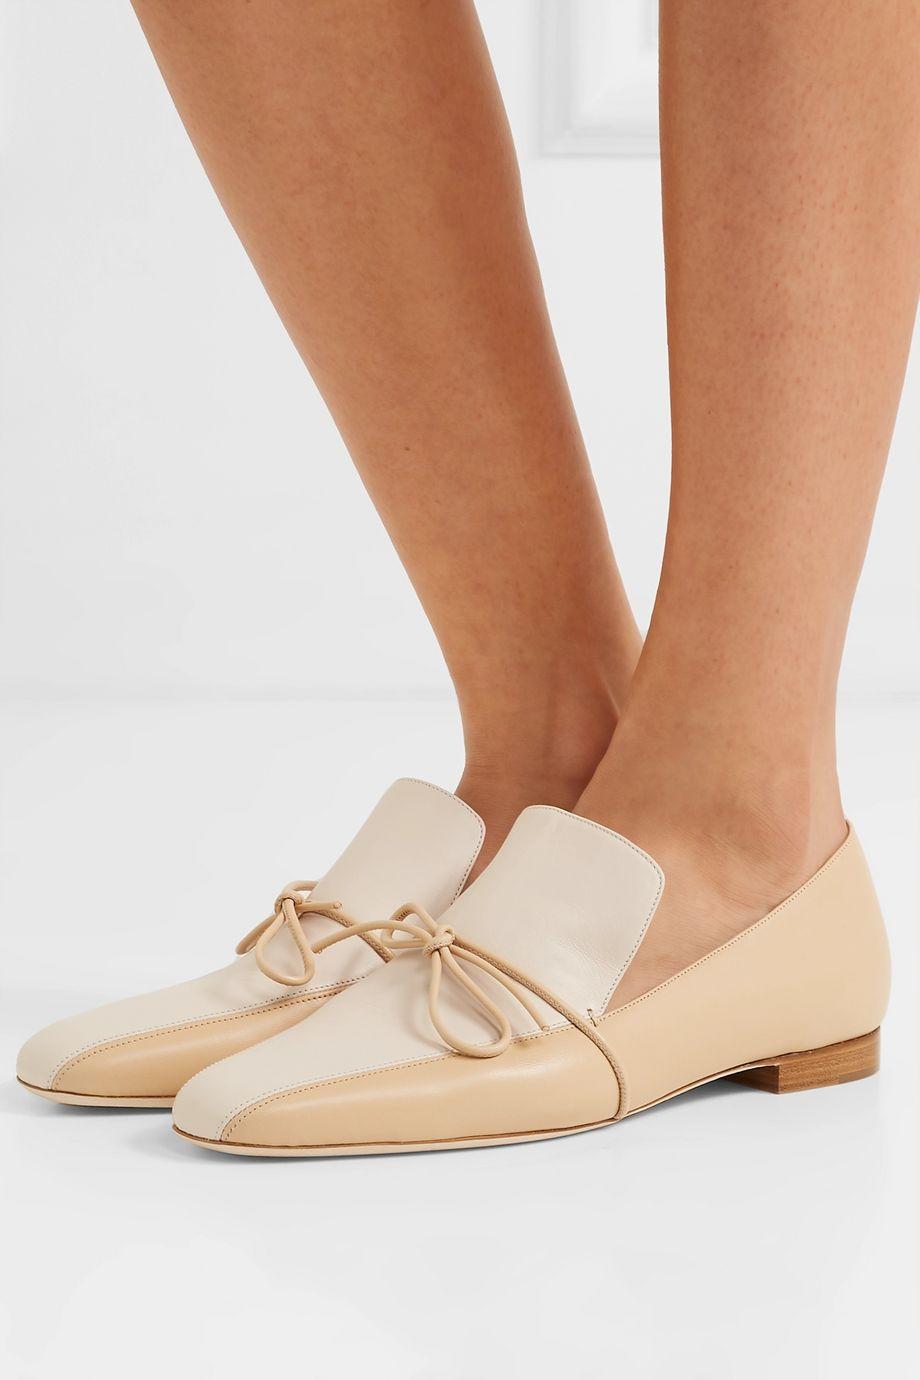 Malone Souliers + Roksanda Marlene Celia two-tone leather loafers